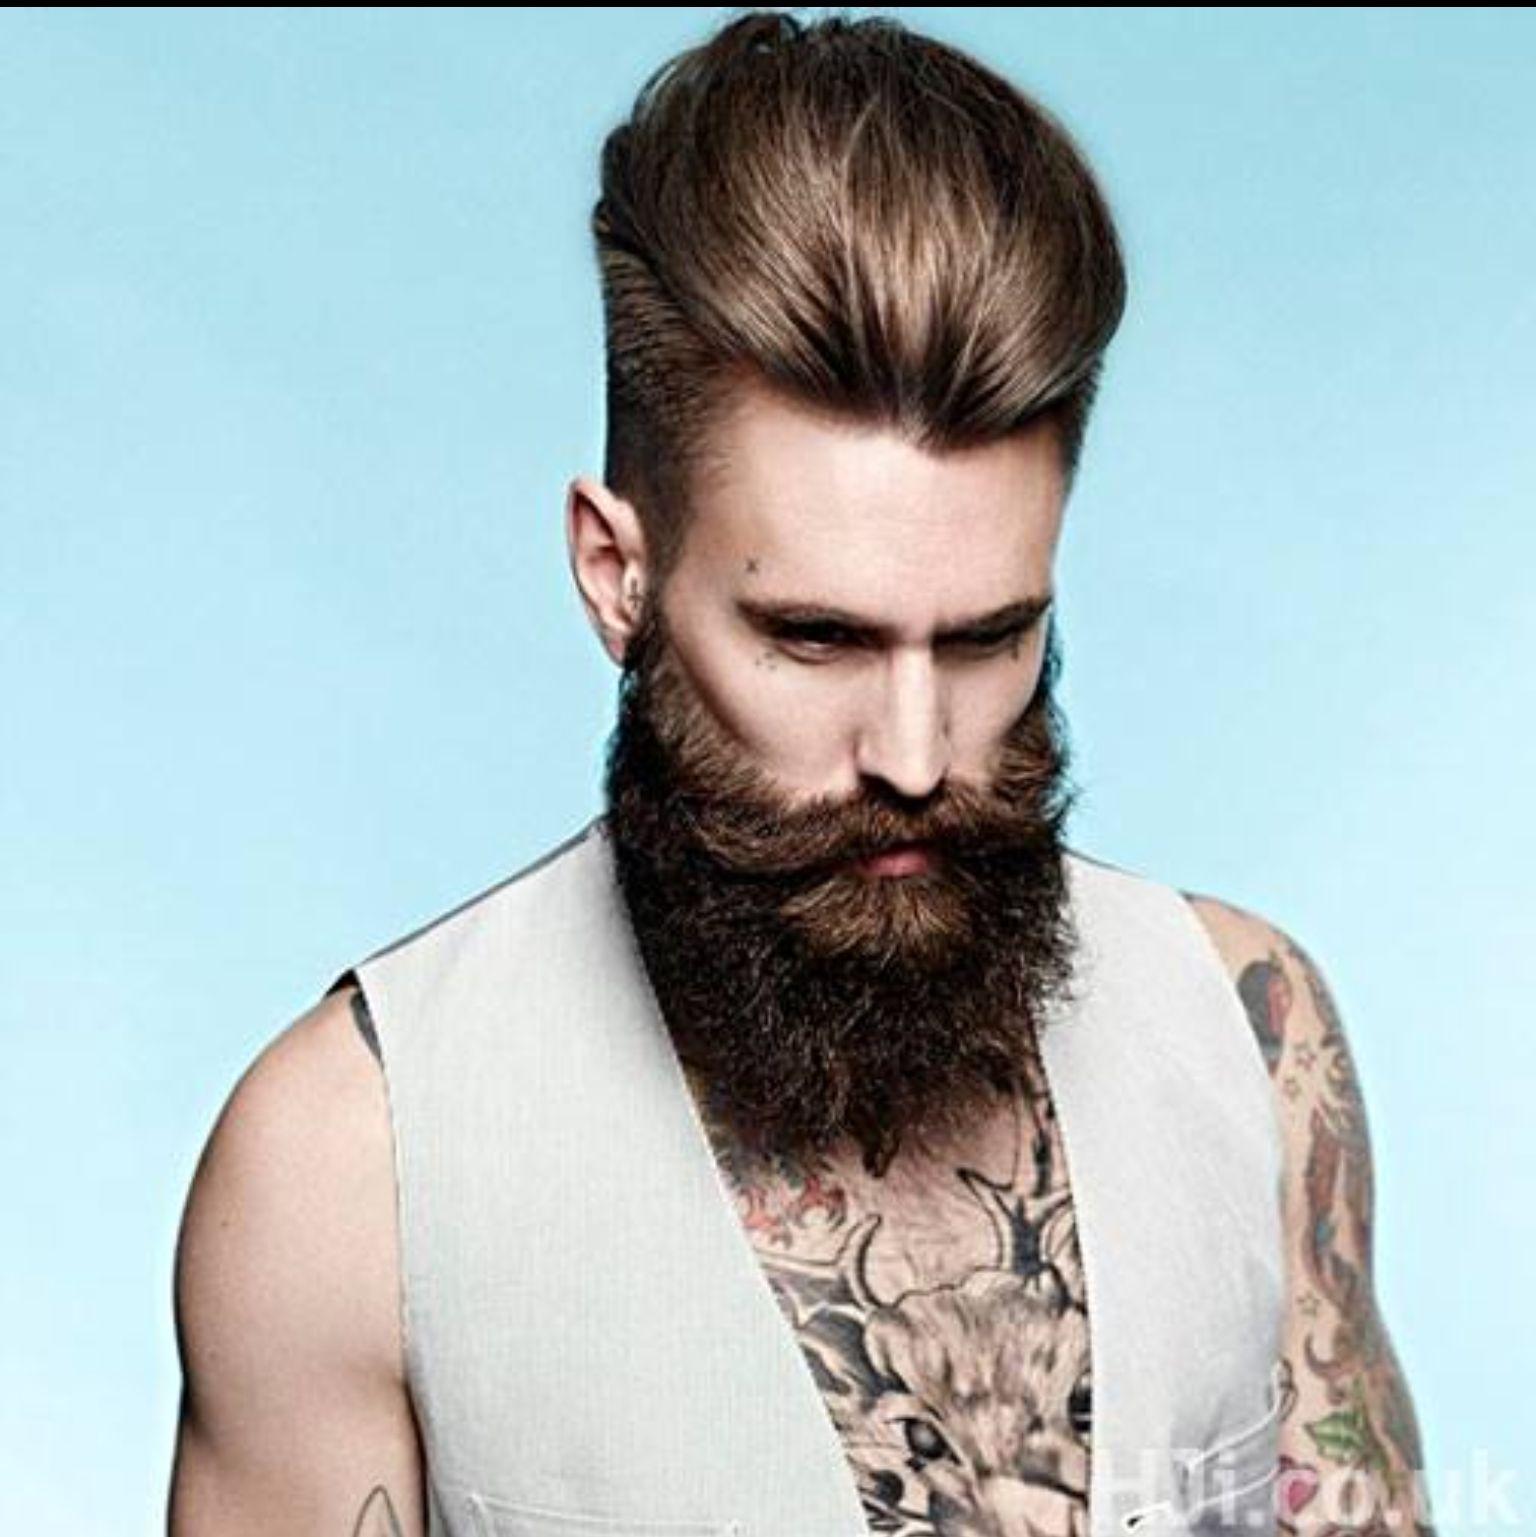 barbermania